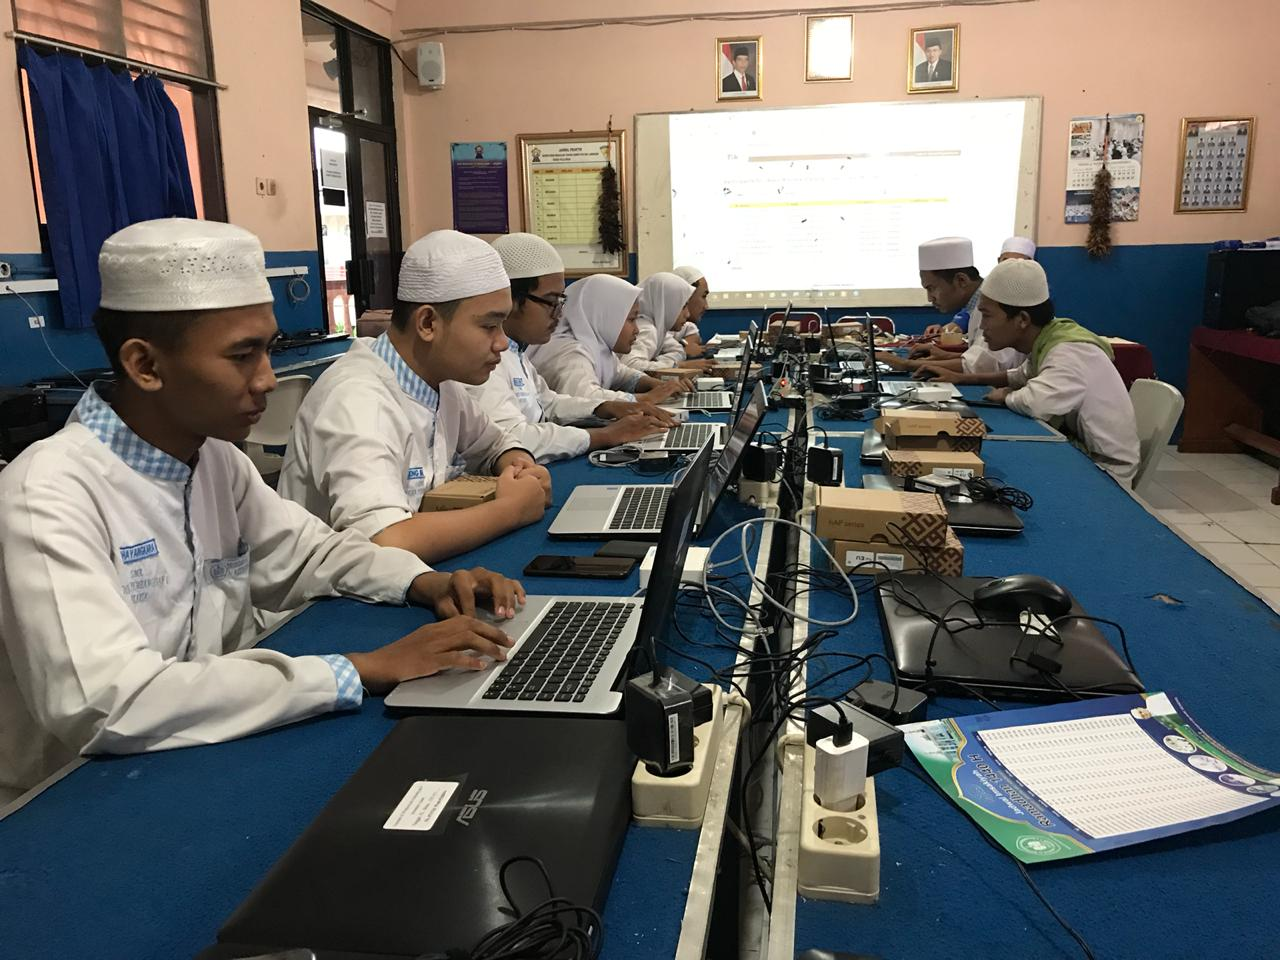 Mikrotik Academy Opening Class Workshop Mikrotik Academy SMK Dinamika Pembangunan 1 Jakarta Batch 1